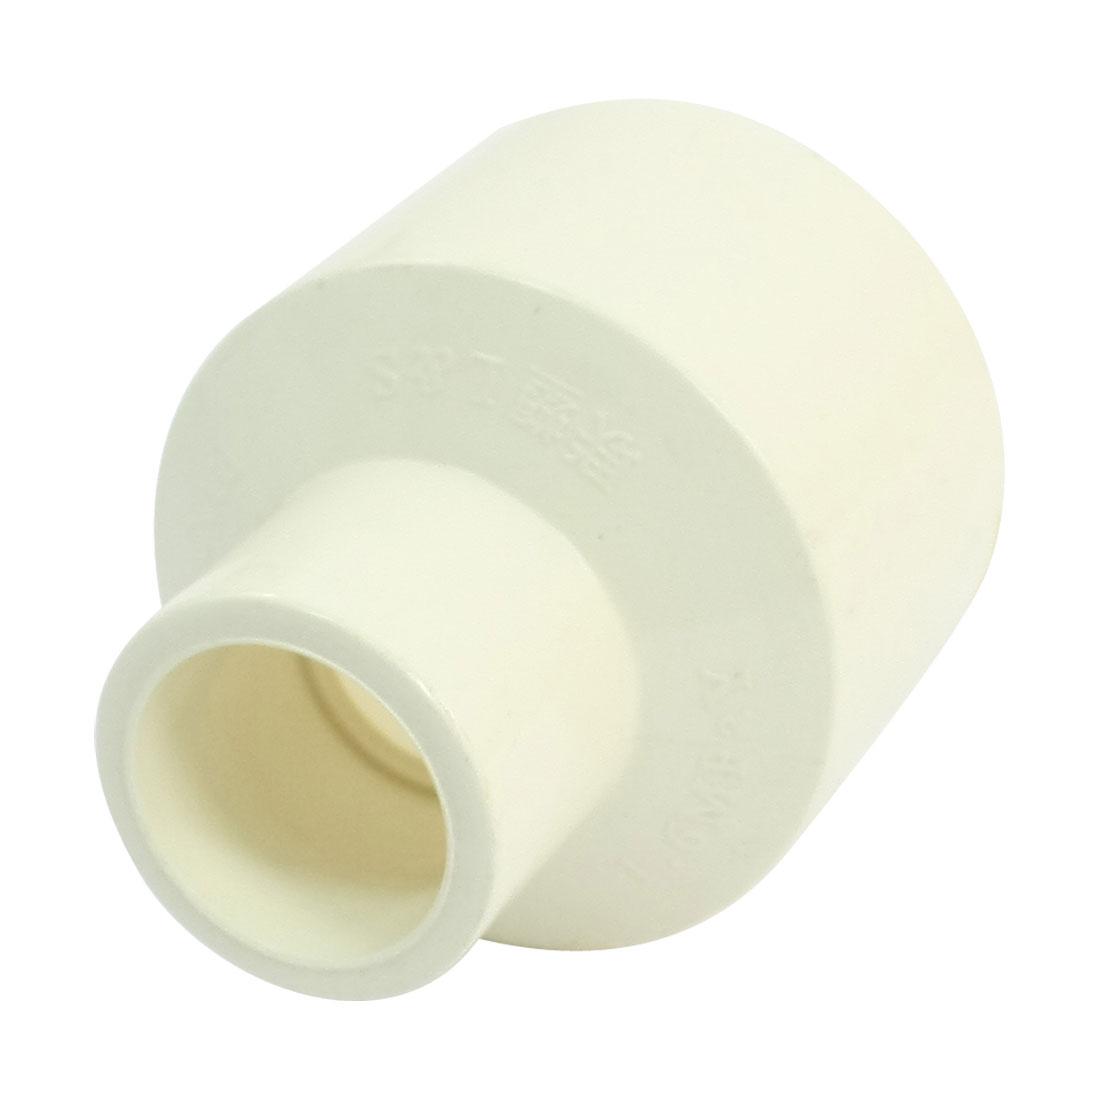 40mm x 20mm Slip x Slip White PVC Water Pipe Straight Connector Coupler